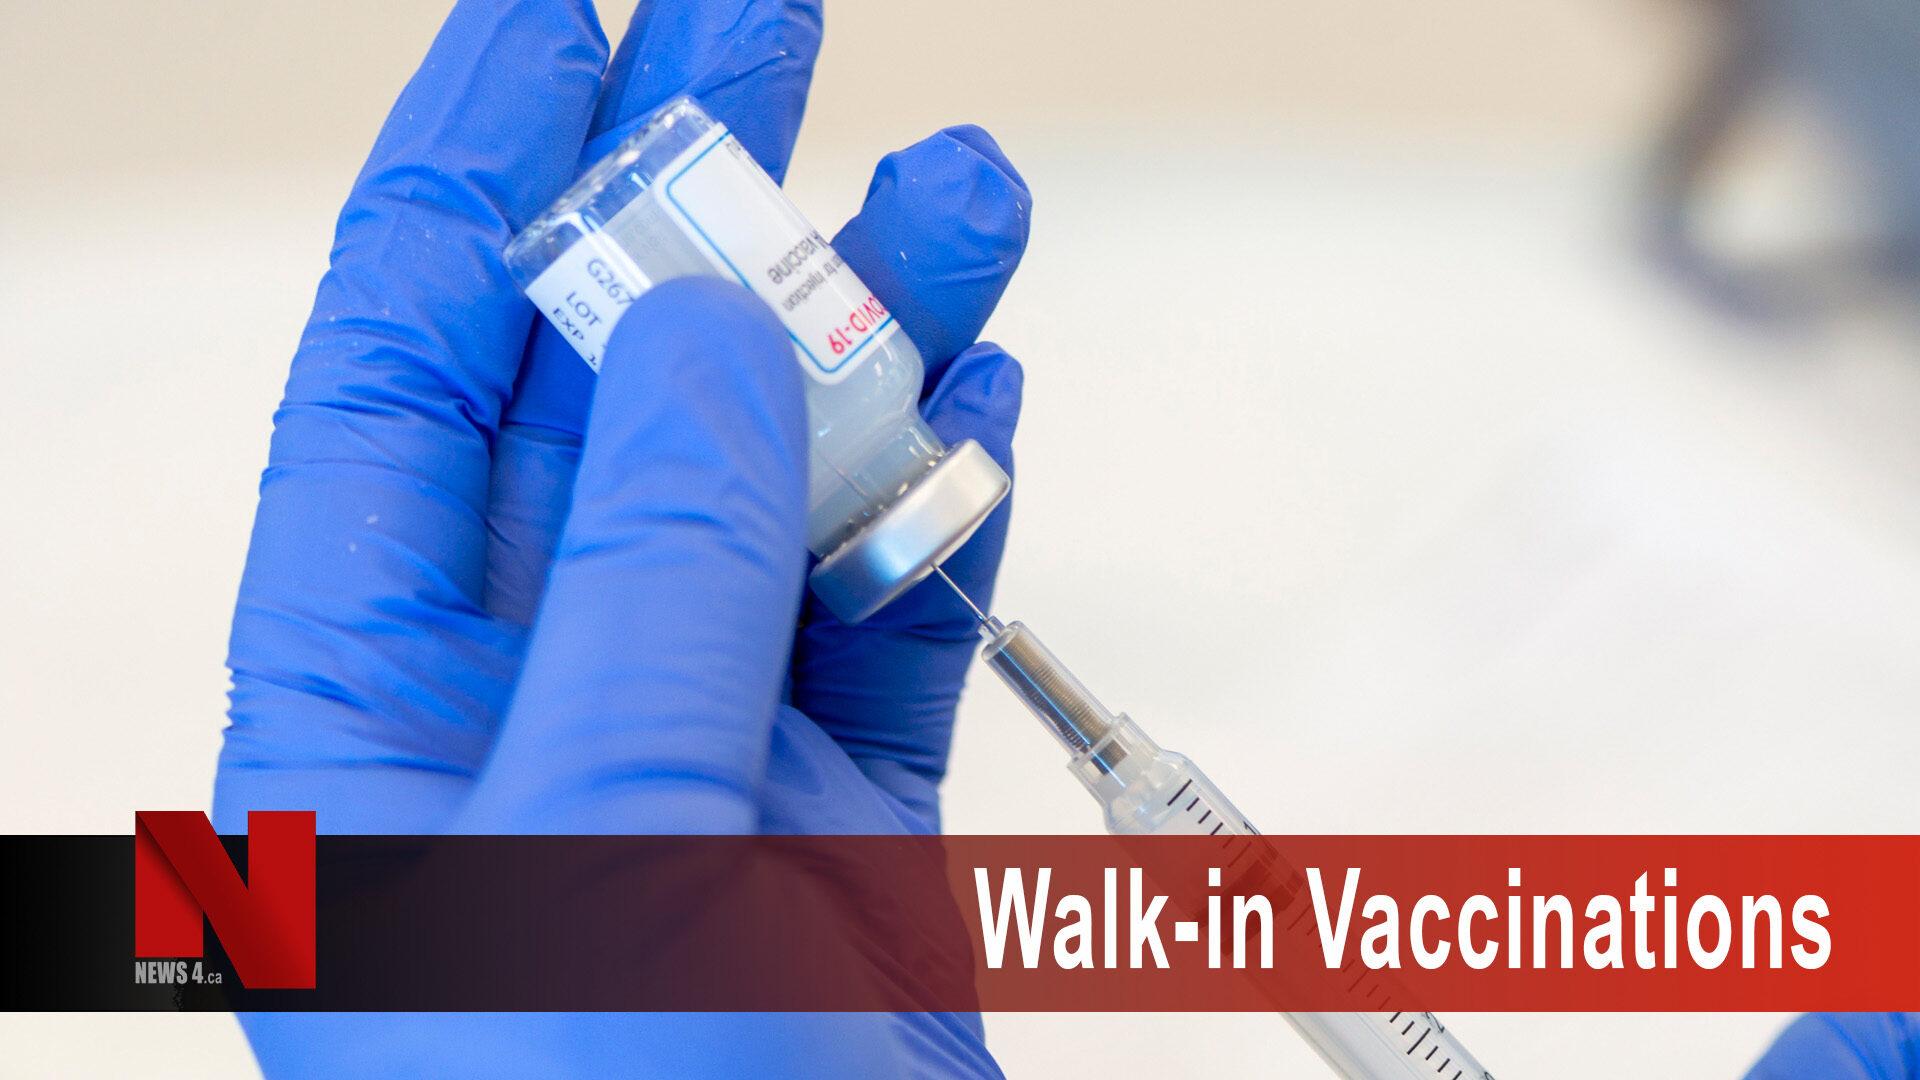 Walk-in Vaccinations